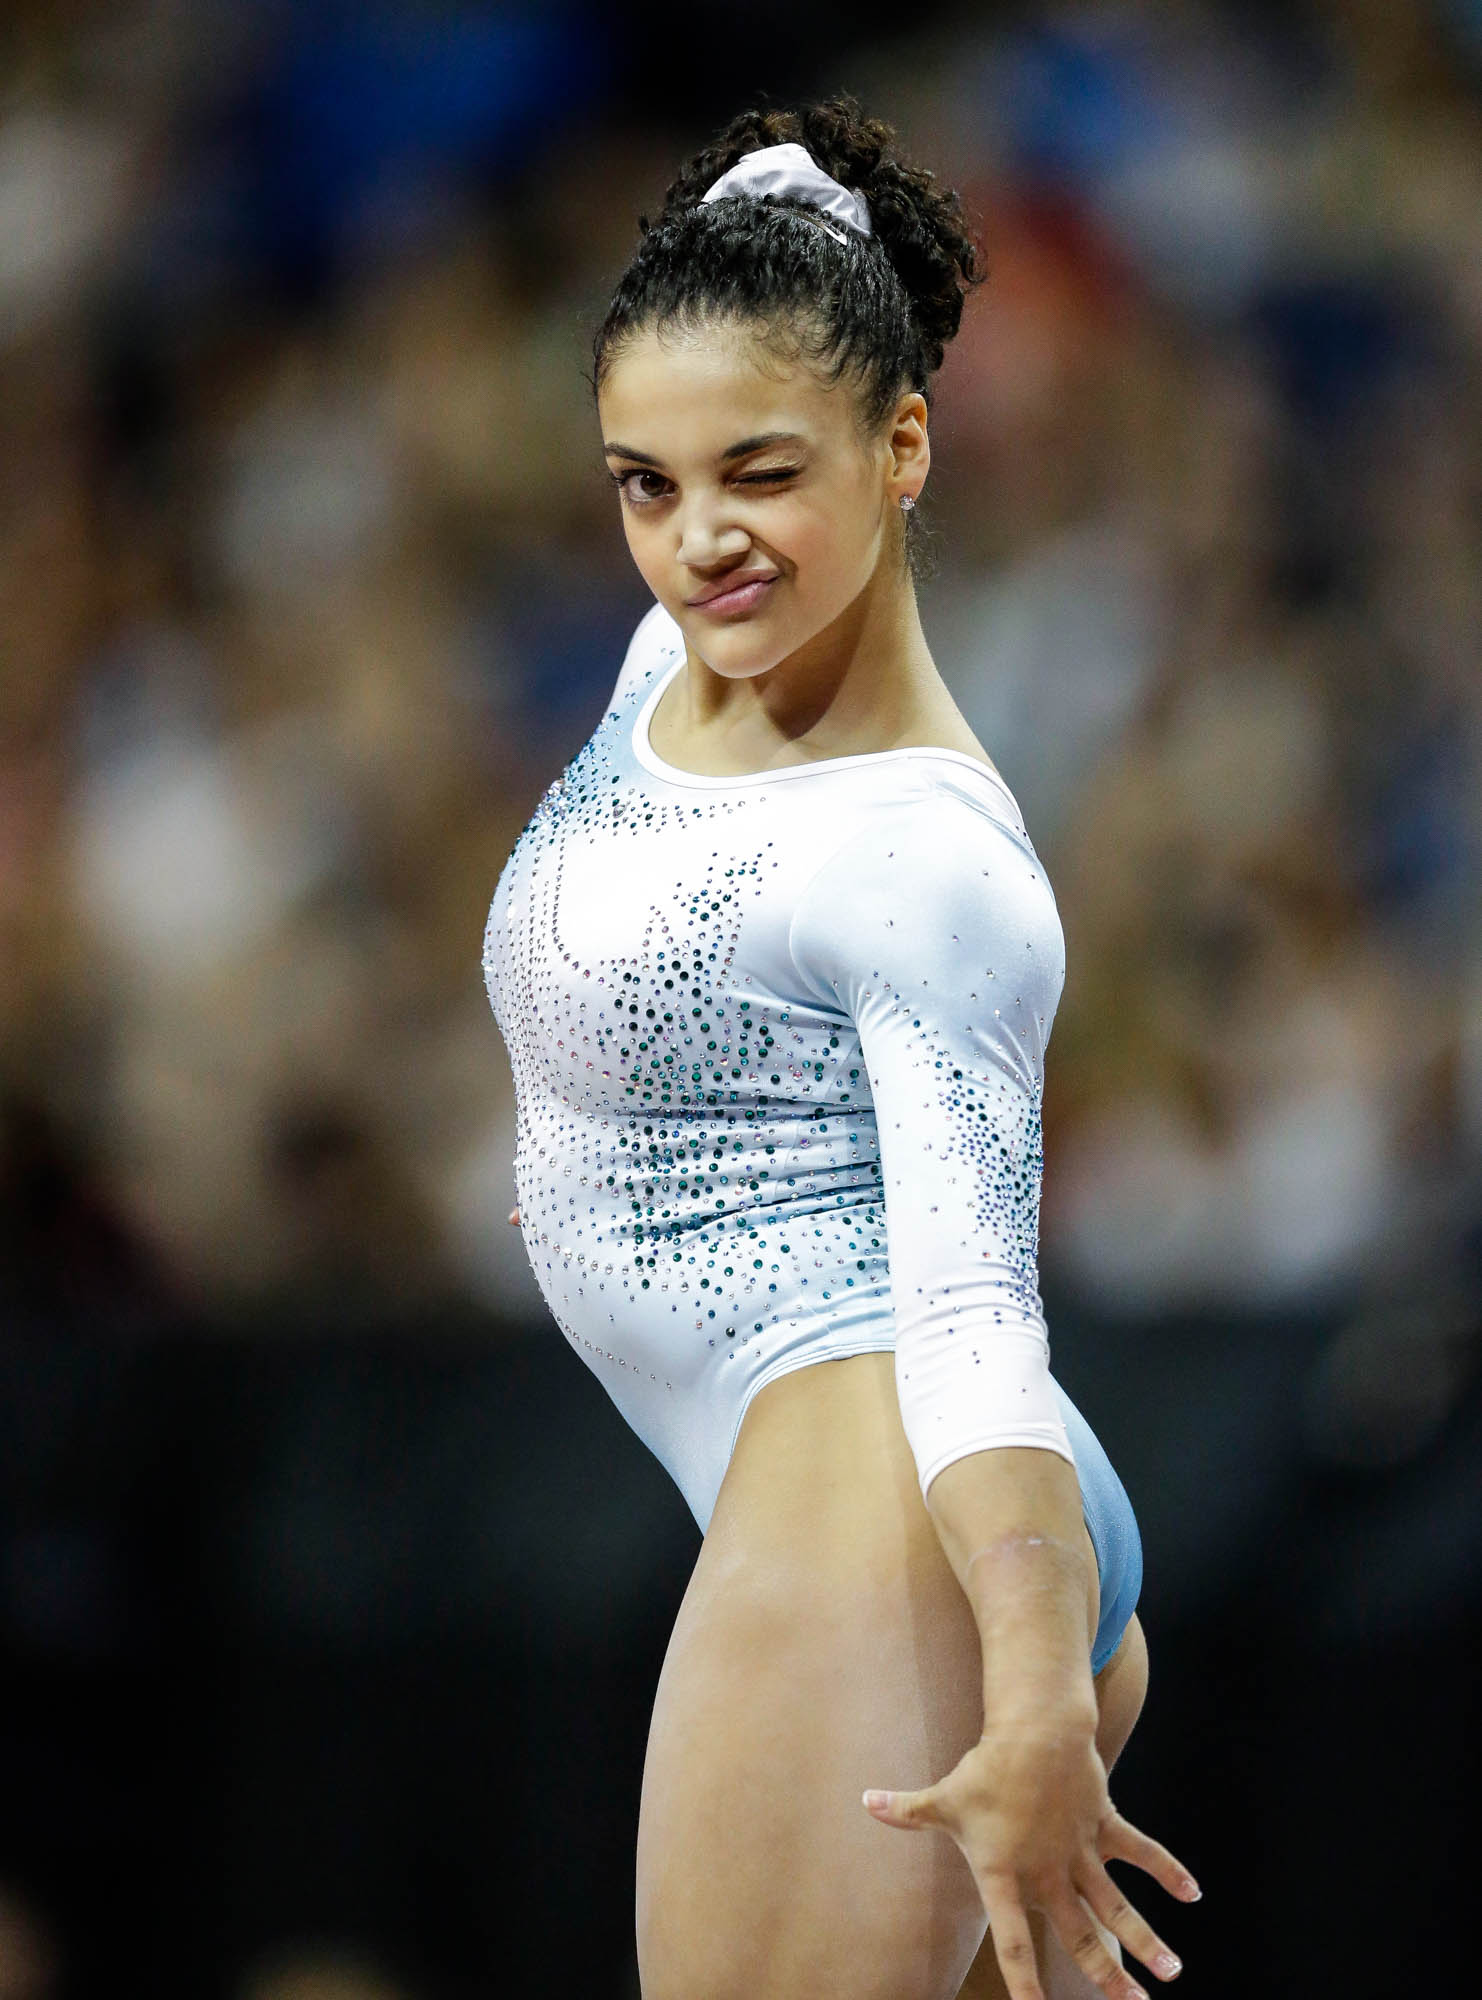 Laurie Hernandez winking during floor routine (© AP Images)